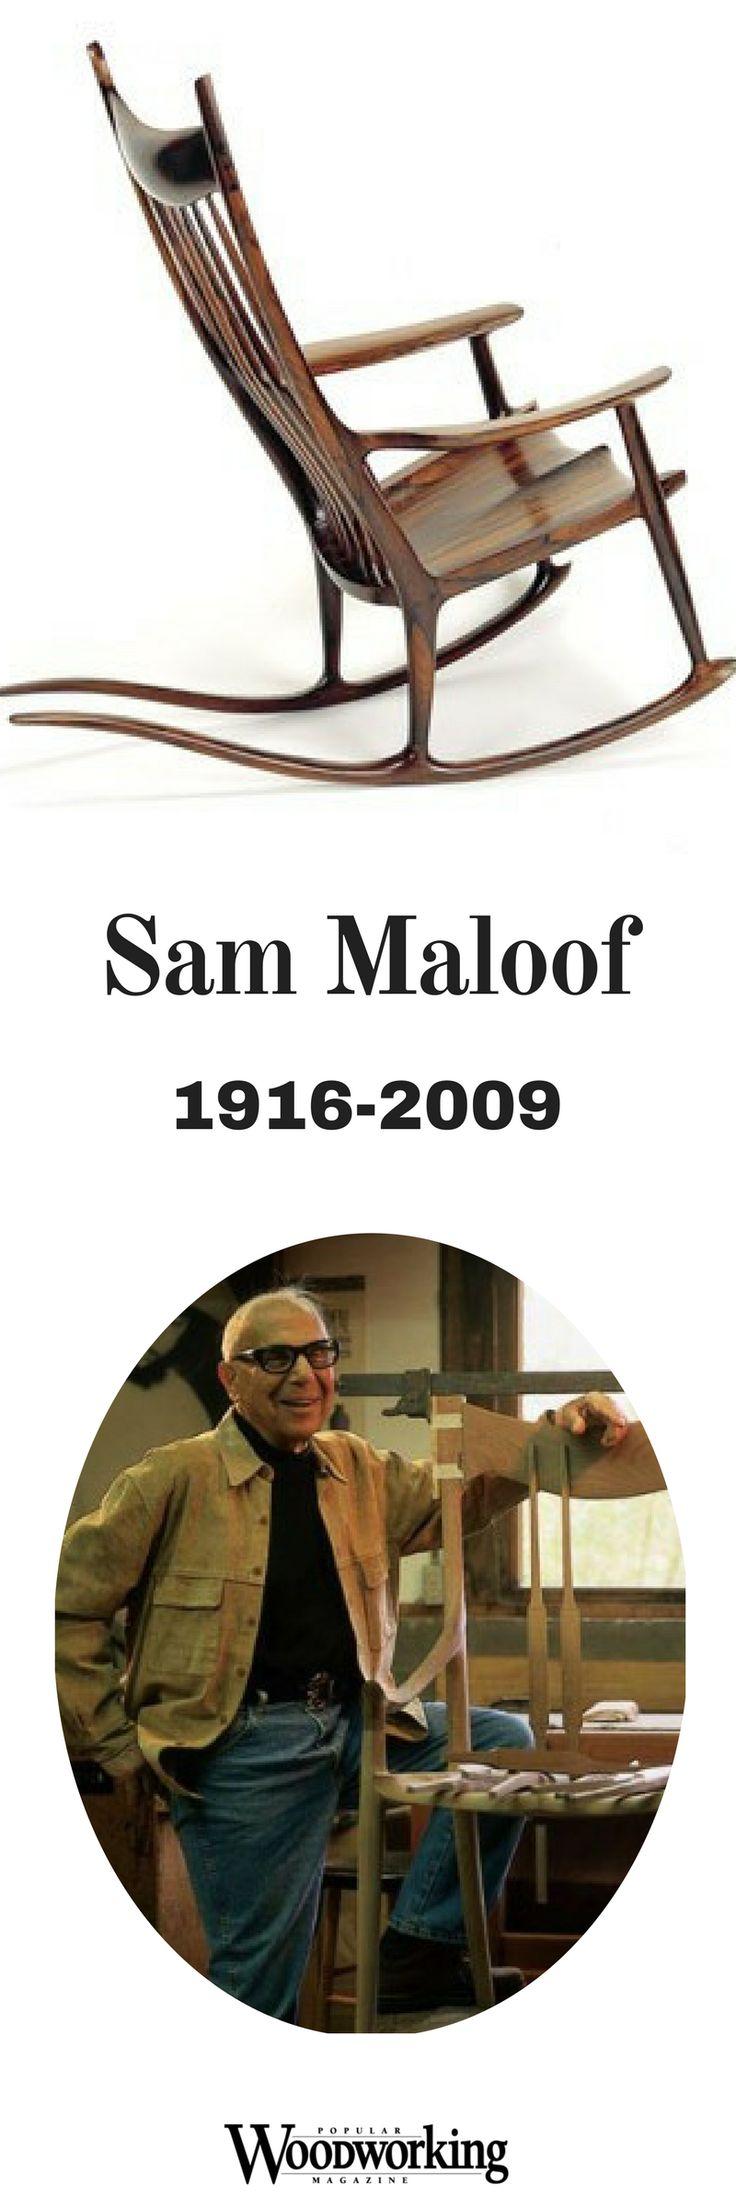 Sam Maloof, 1916-2009